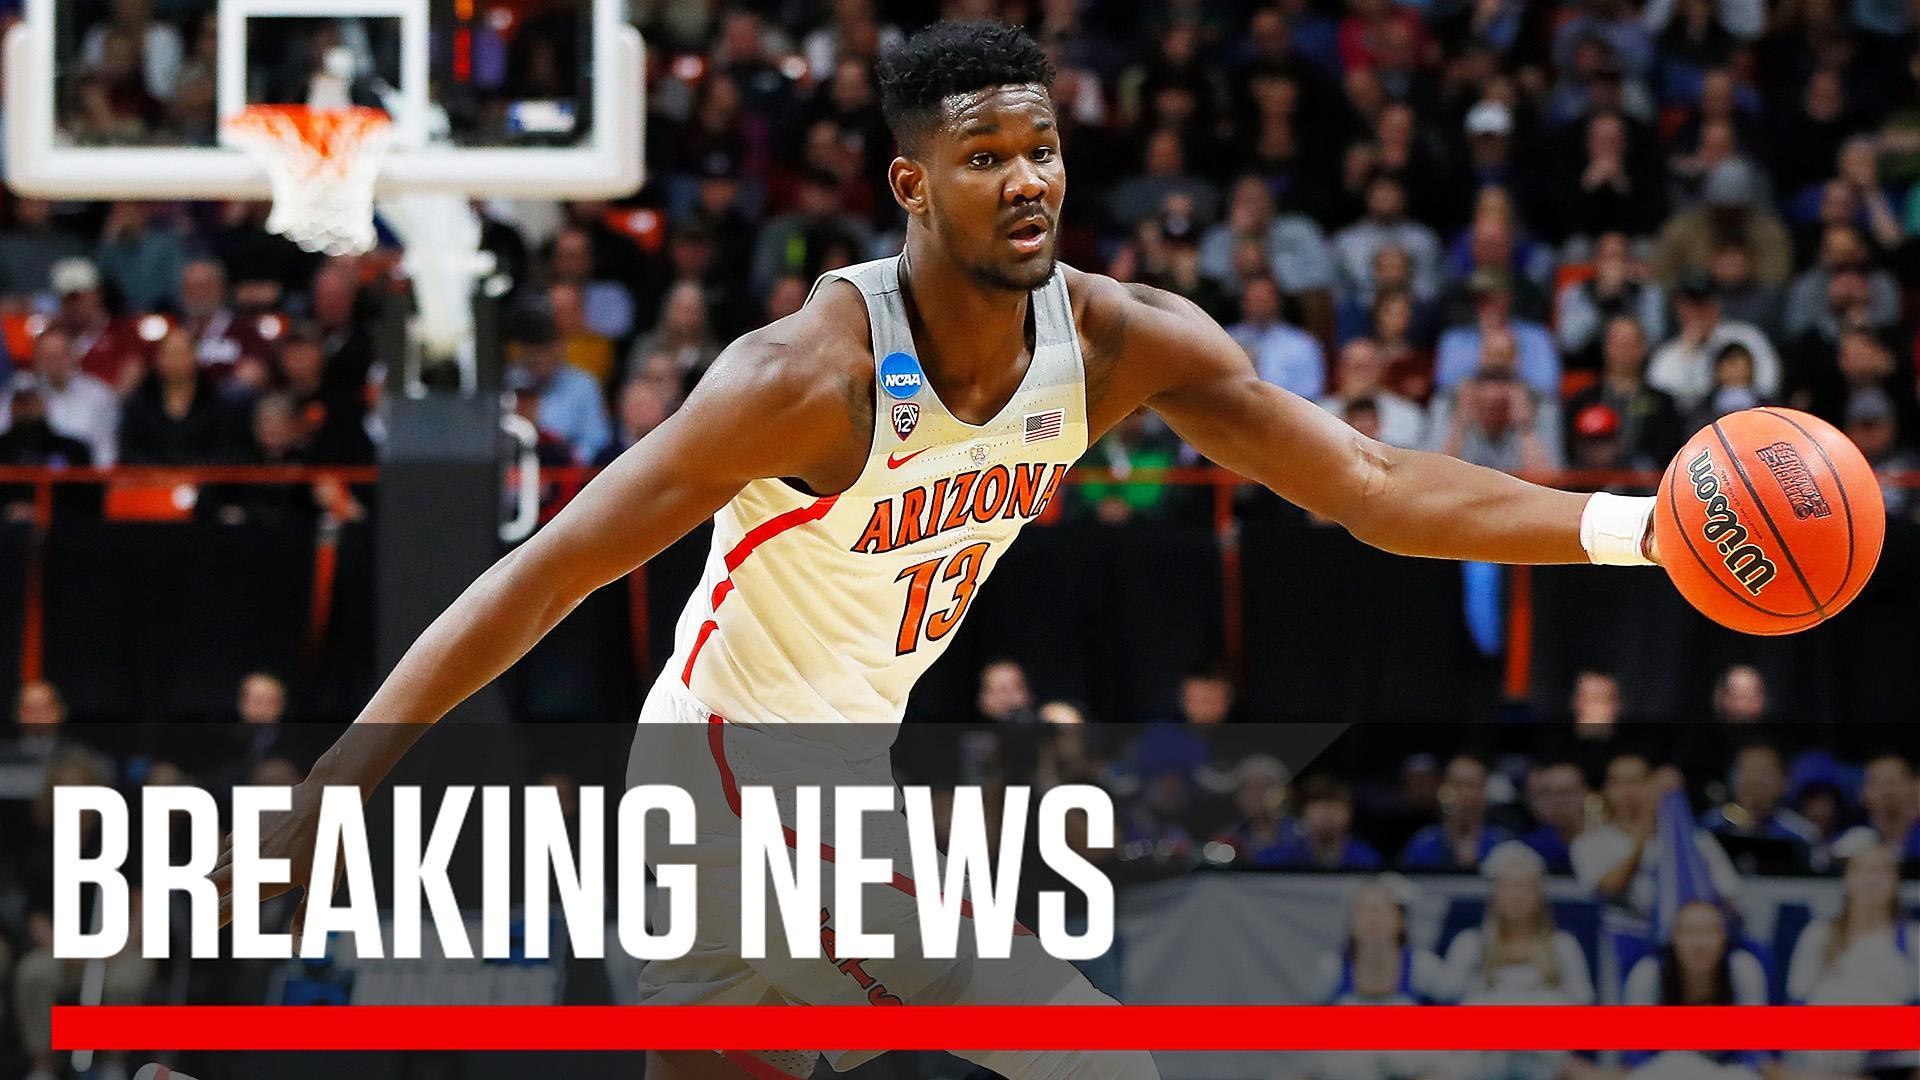 Breaking: Arizona freshman Deandre Ayton announces on Twitter he is declaring for the NBA draft. https://t.co/0Lc33zrTUM